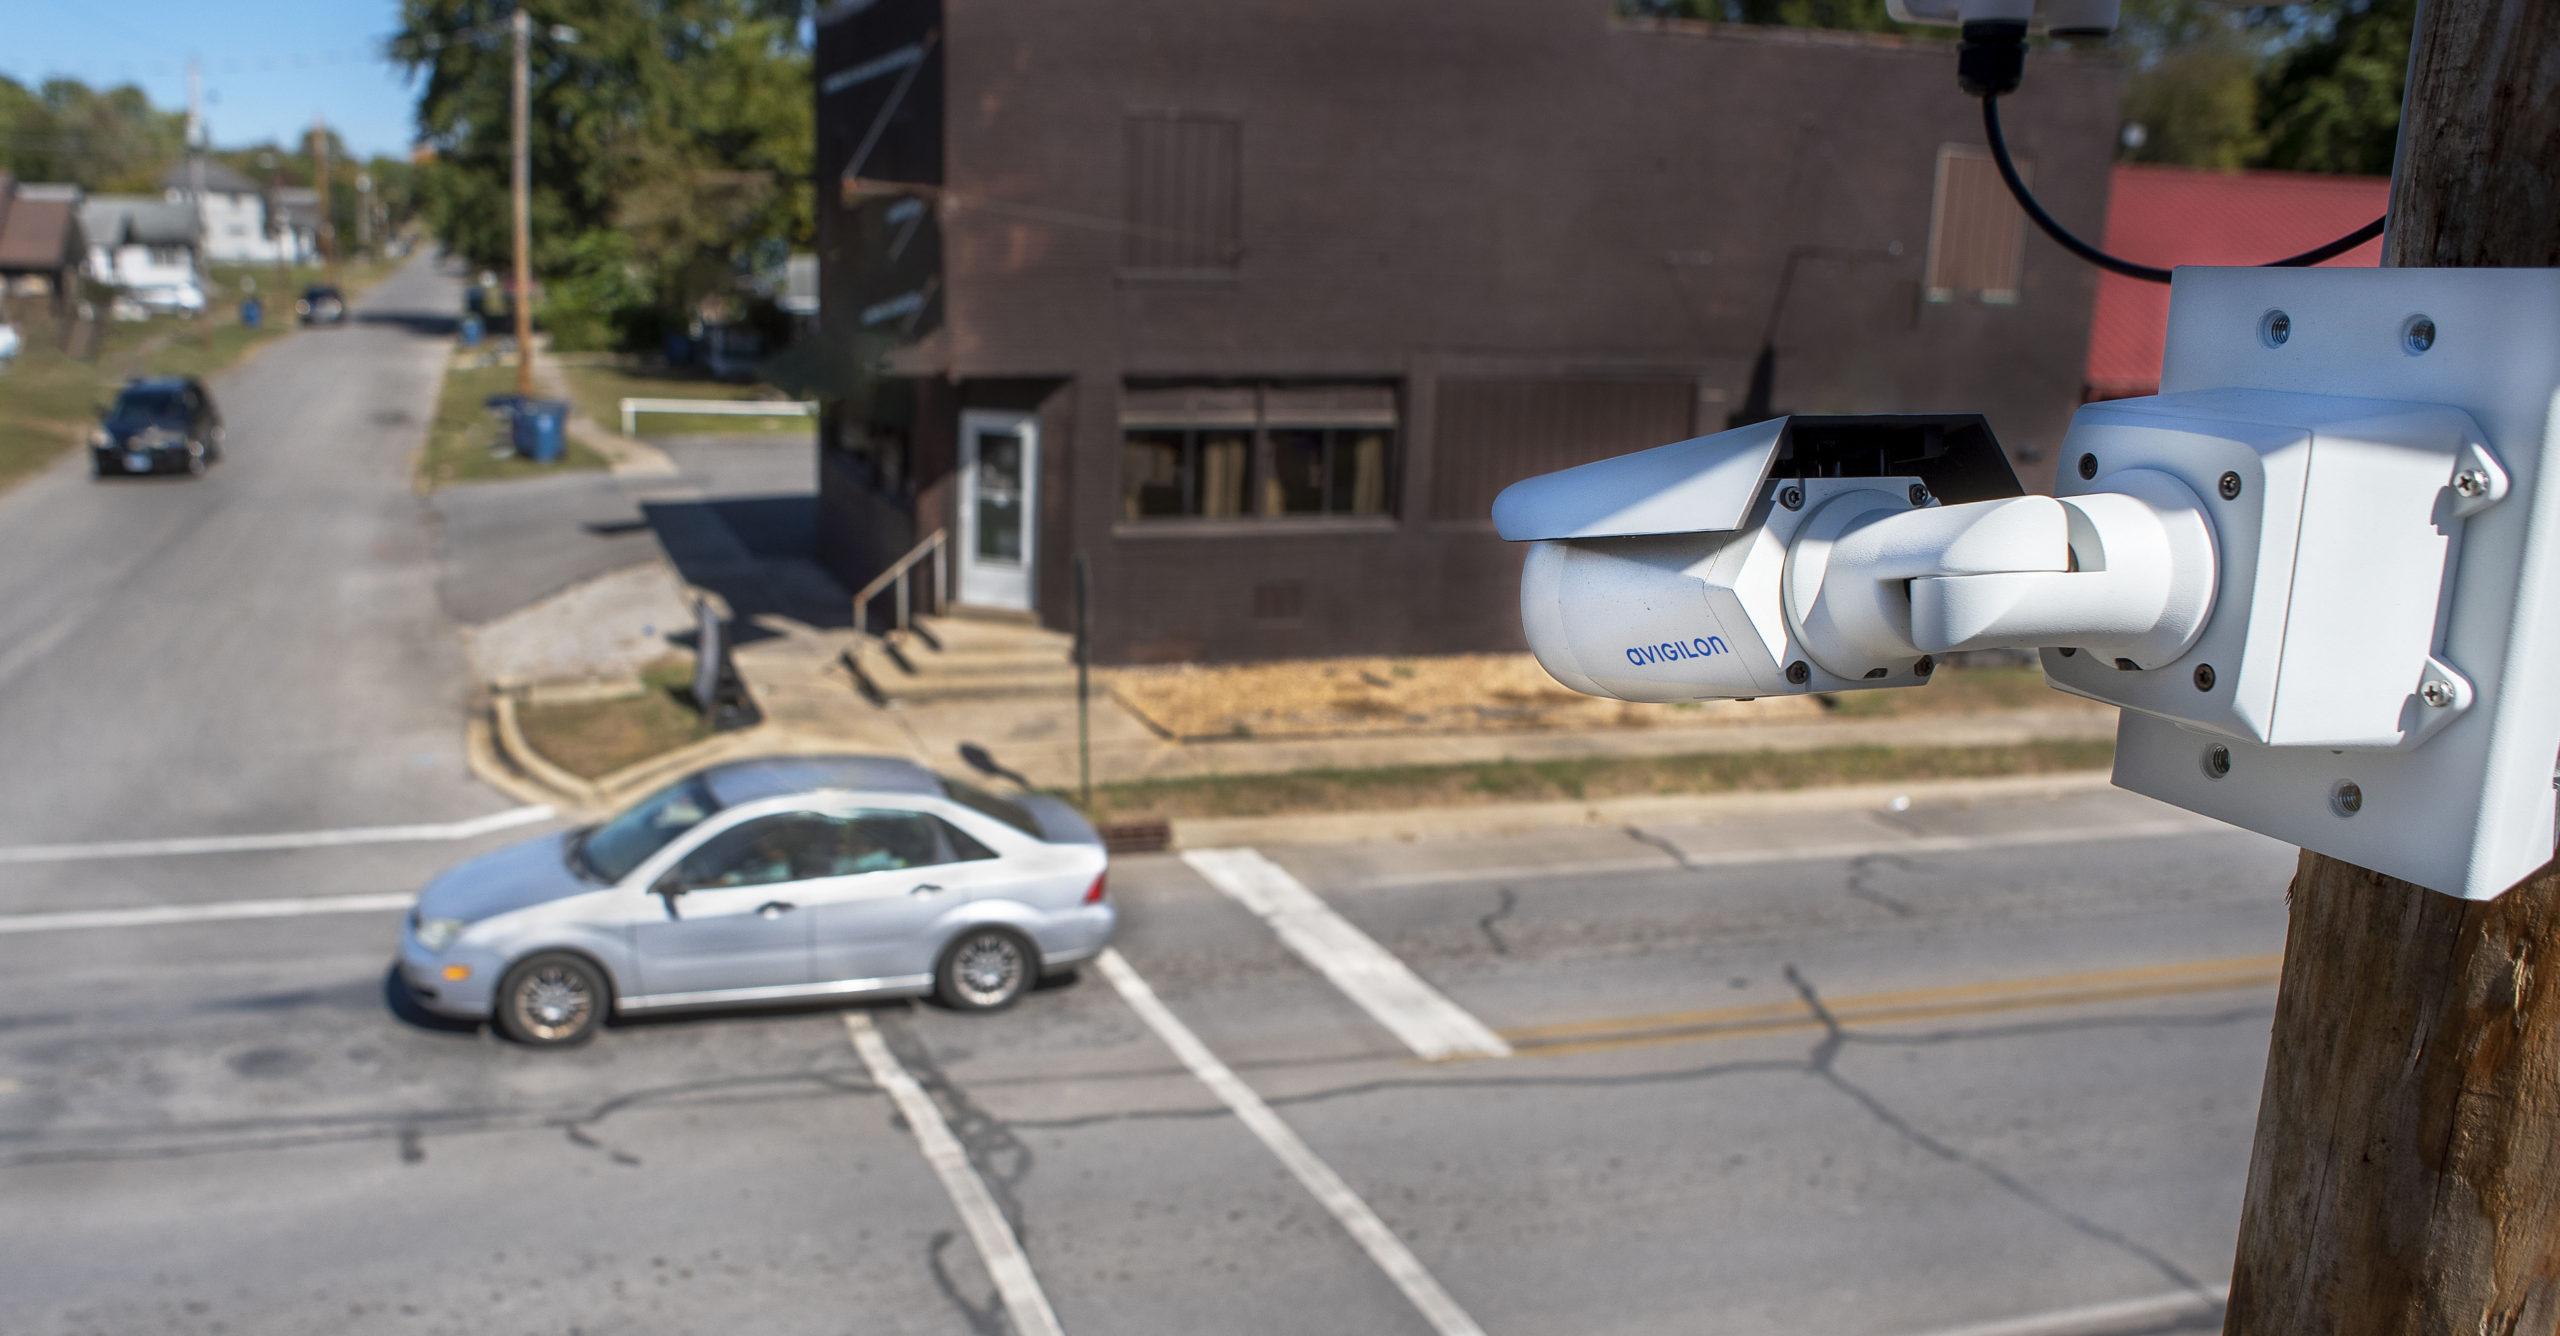 remote security camera at intersection Mt Vernon Illinois